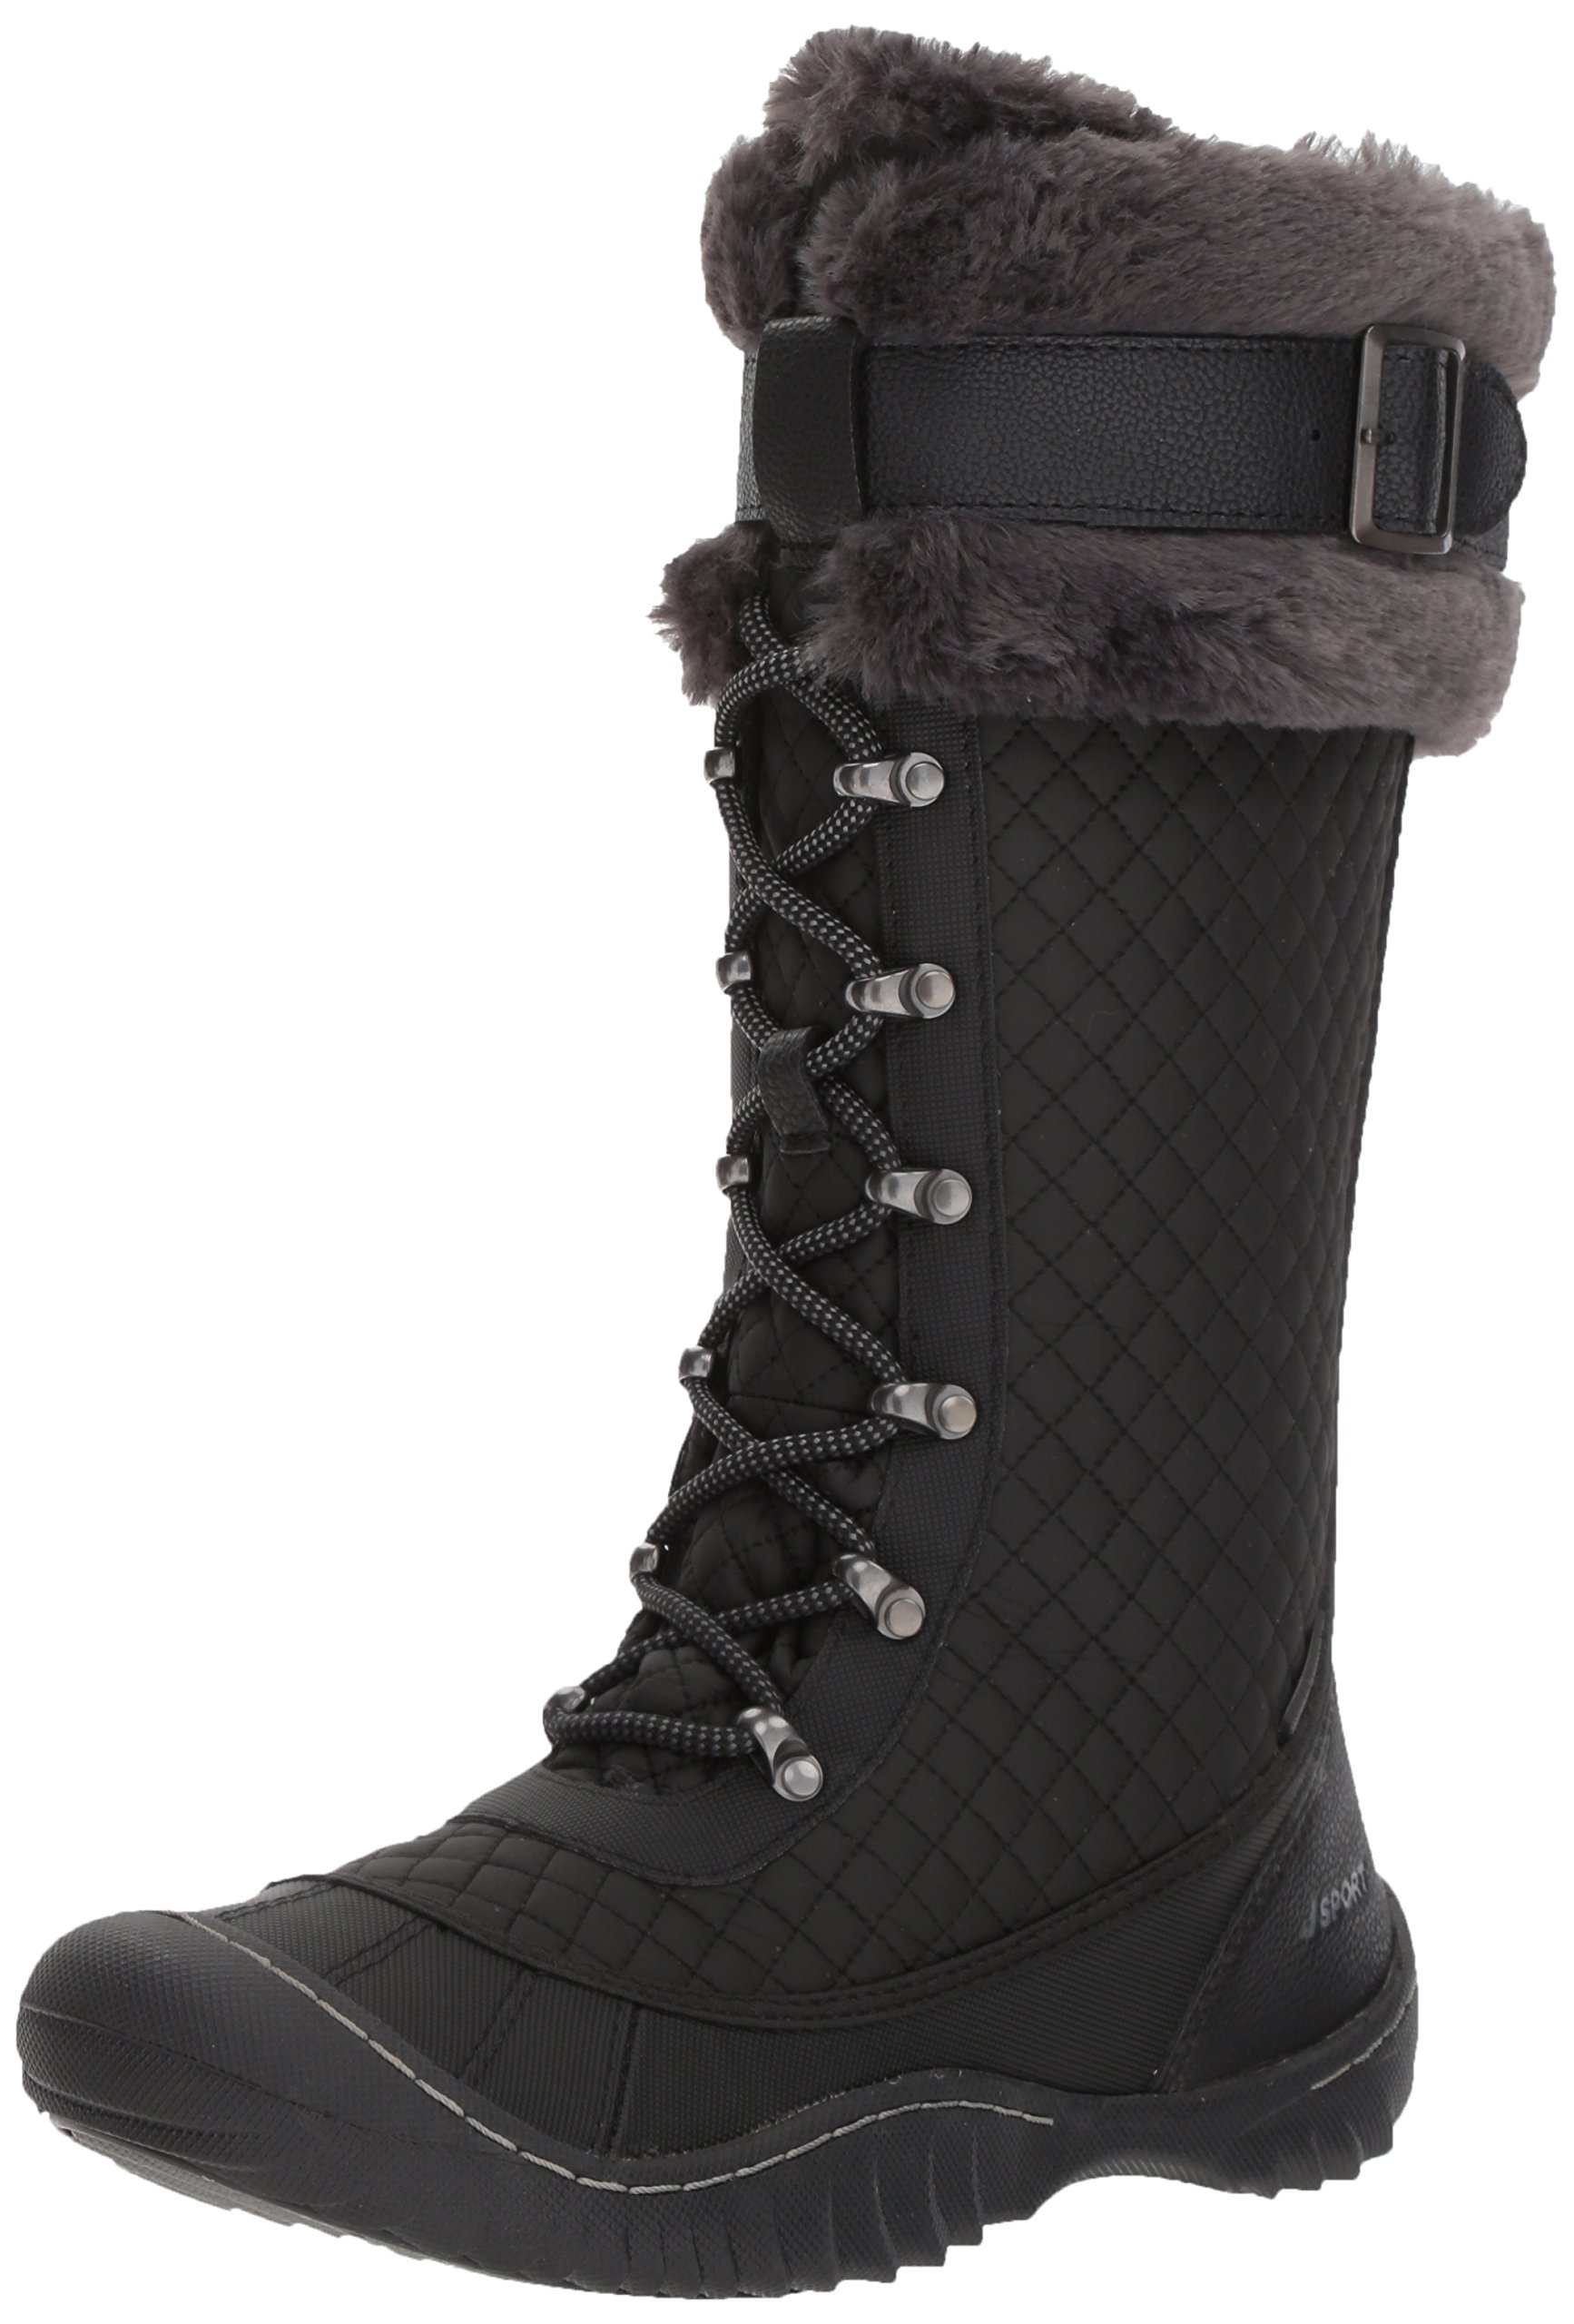 JSport by Jambu Women's Wingate Weather Ready Snow Boot, Black, 6.5 M US